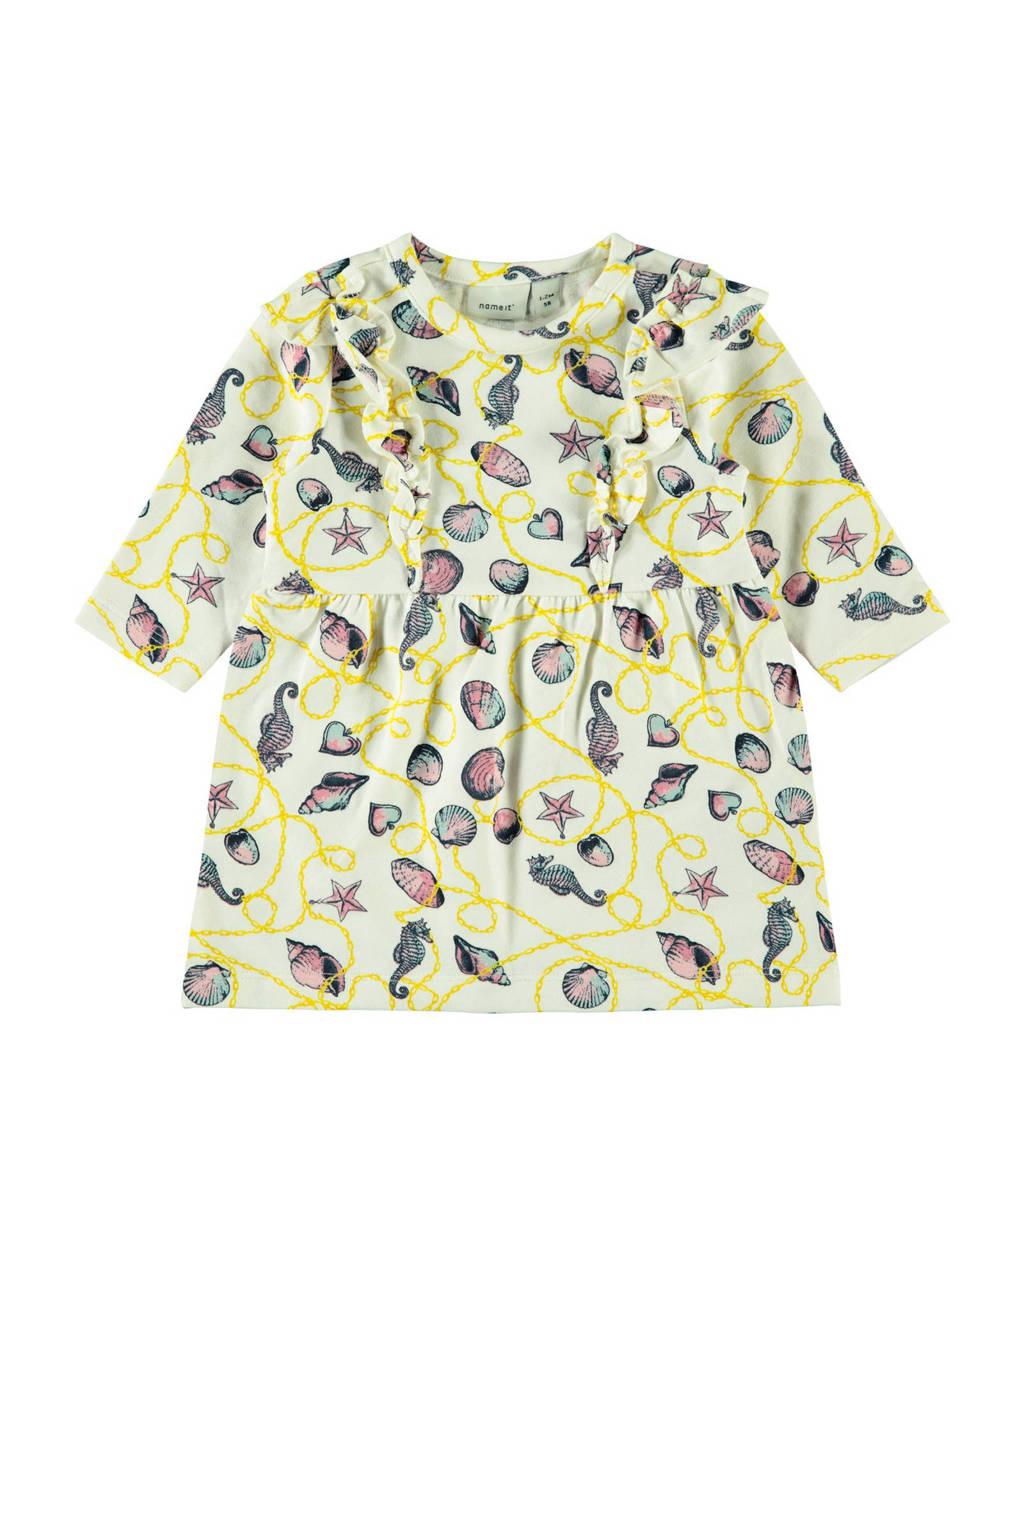 NAME IT BABY sweatjurk Felina met all over print en volant ecru/geel, Ecru/geel